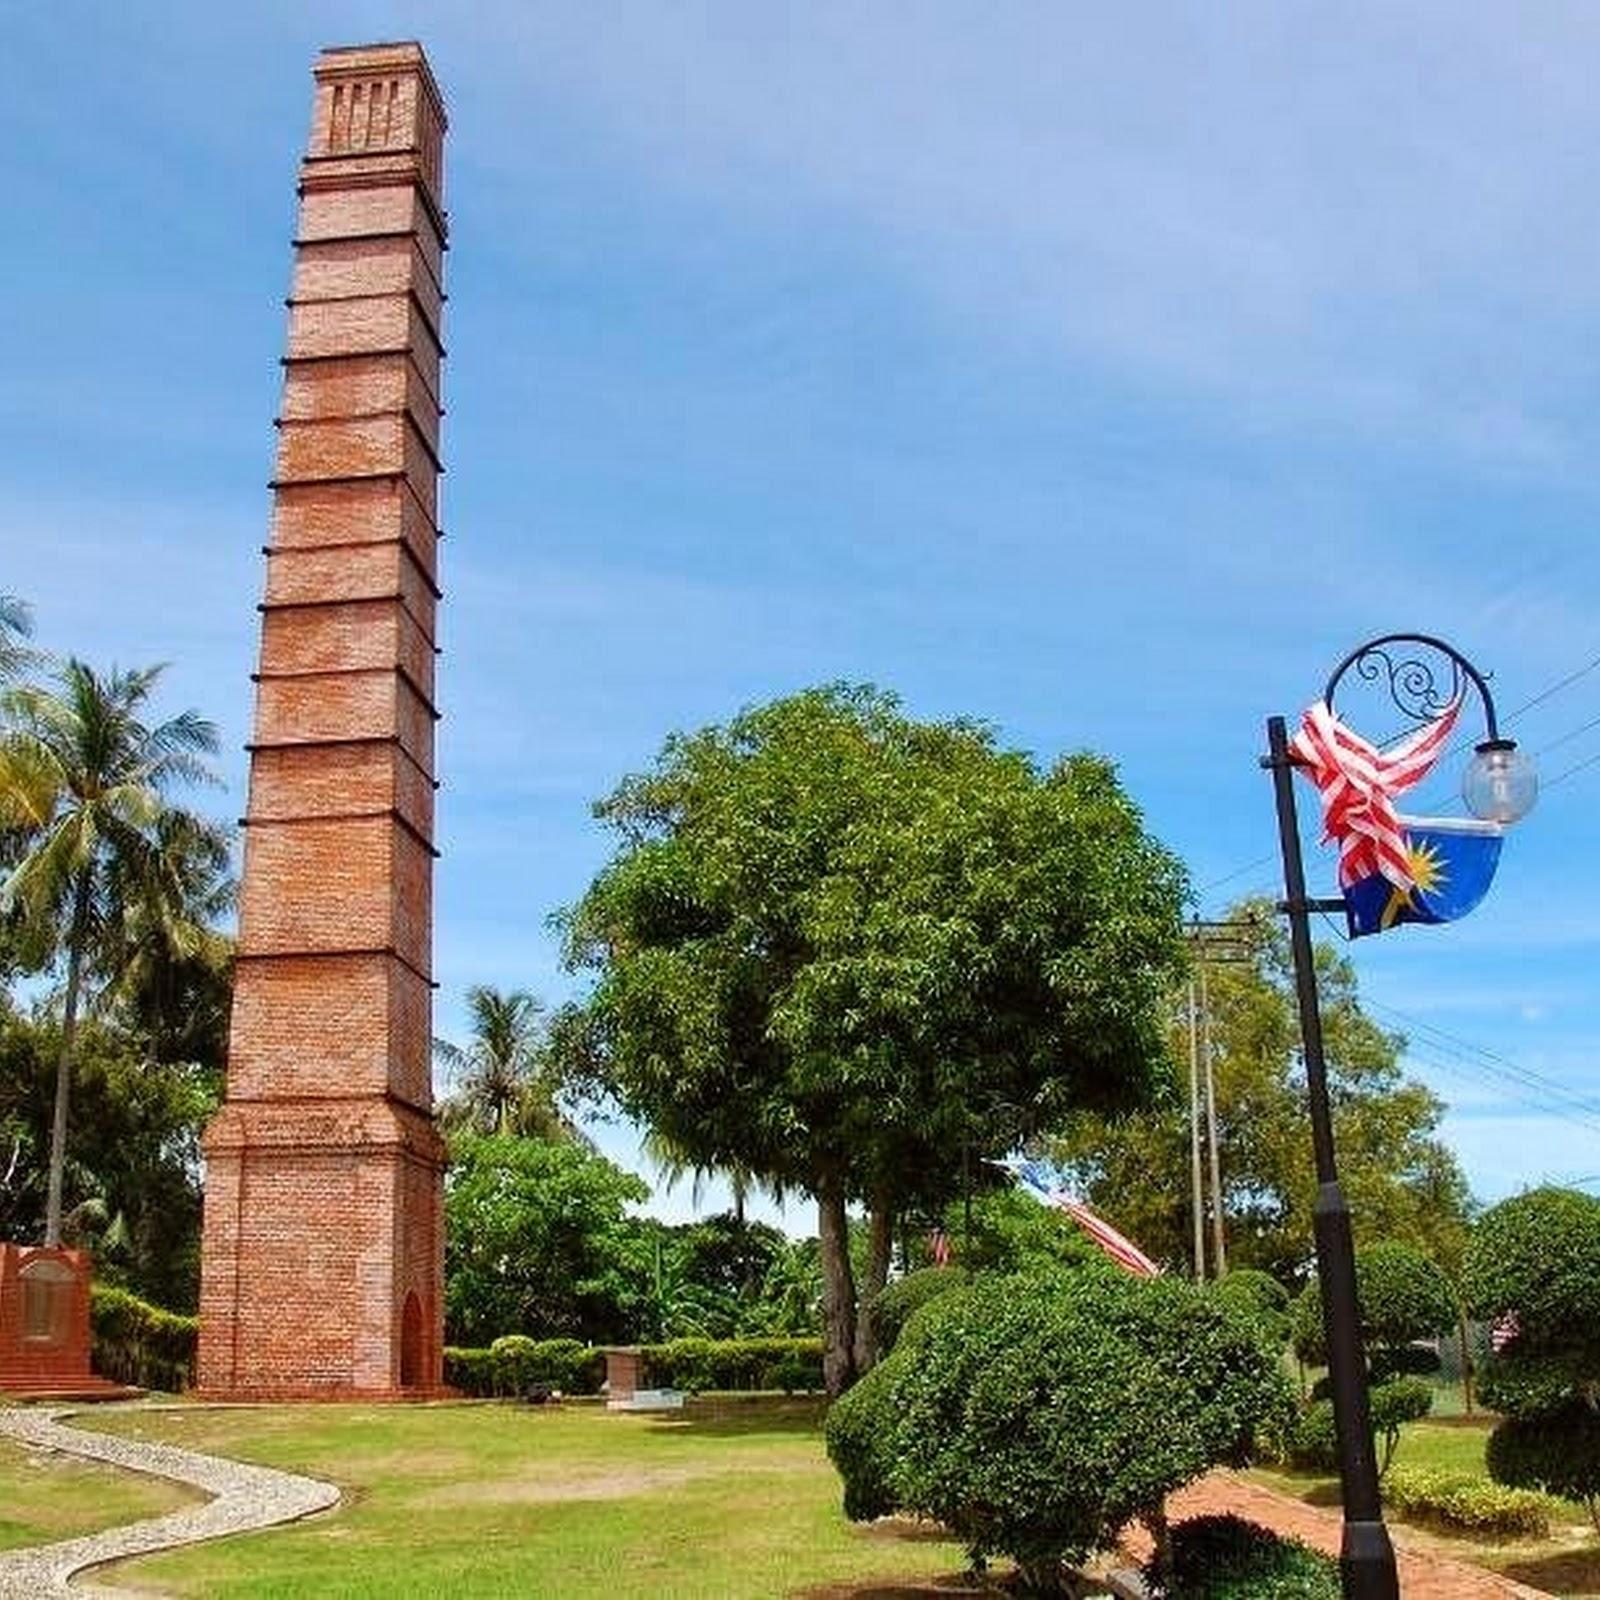 Labuan's Mystery Chimney